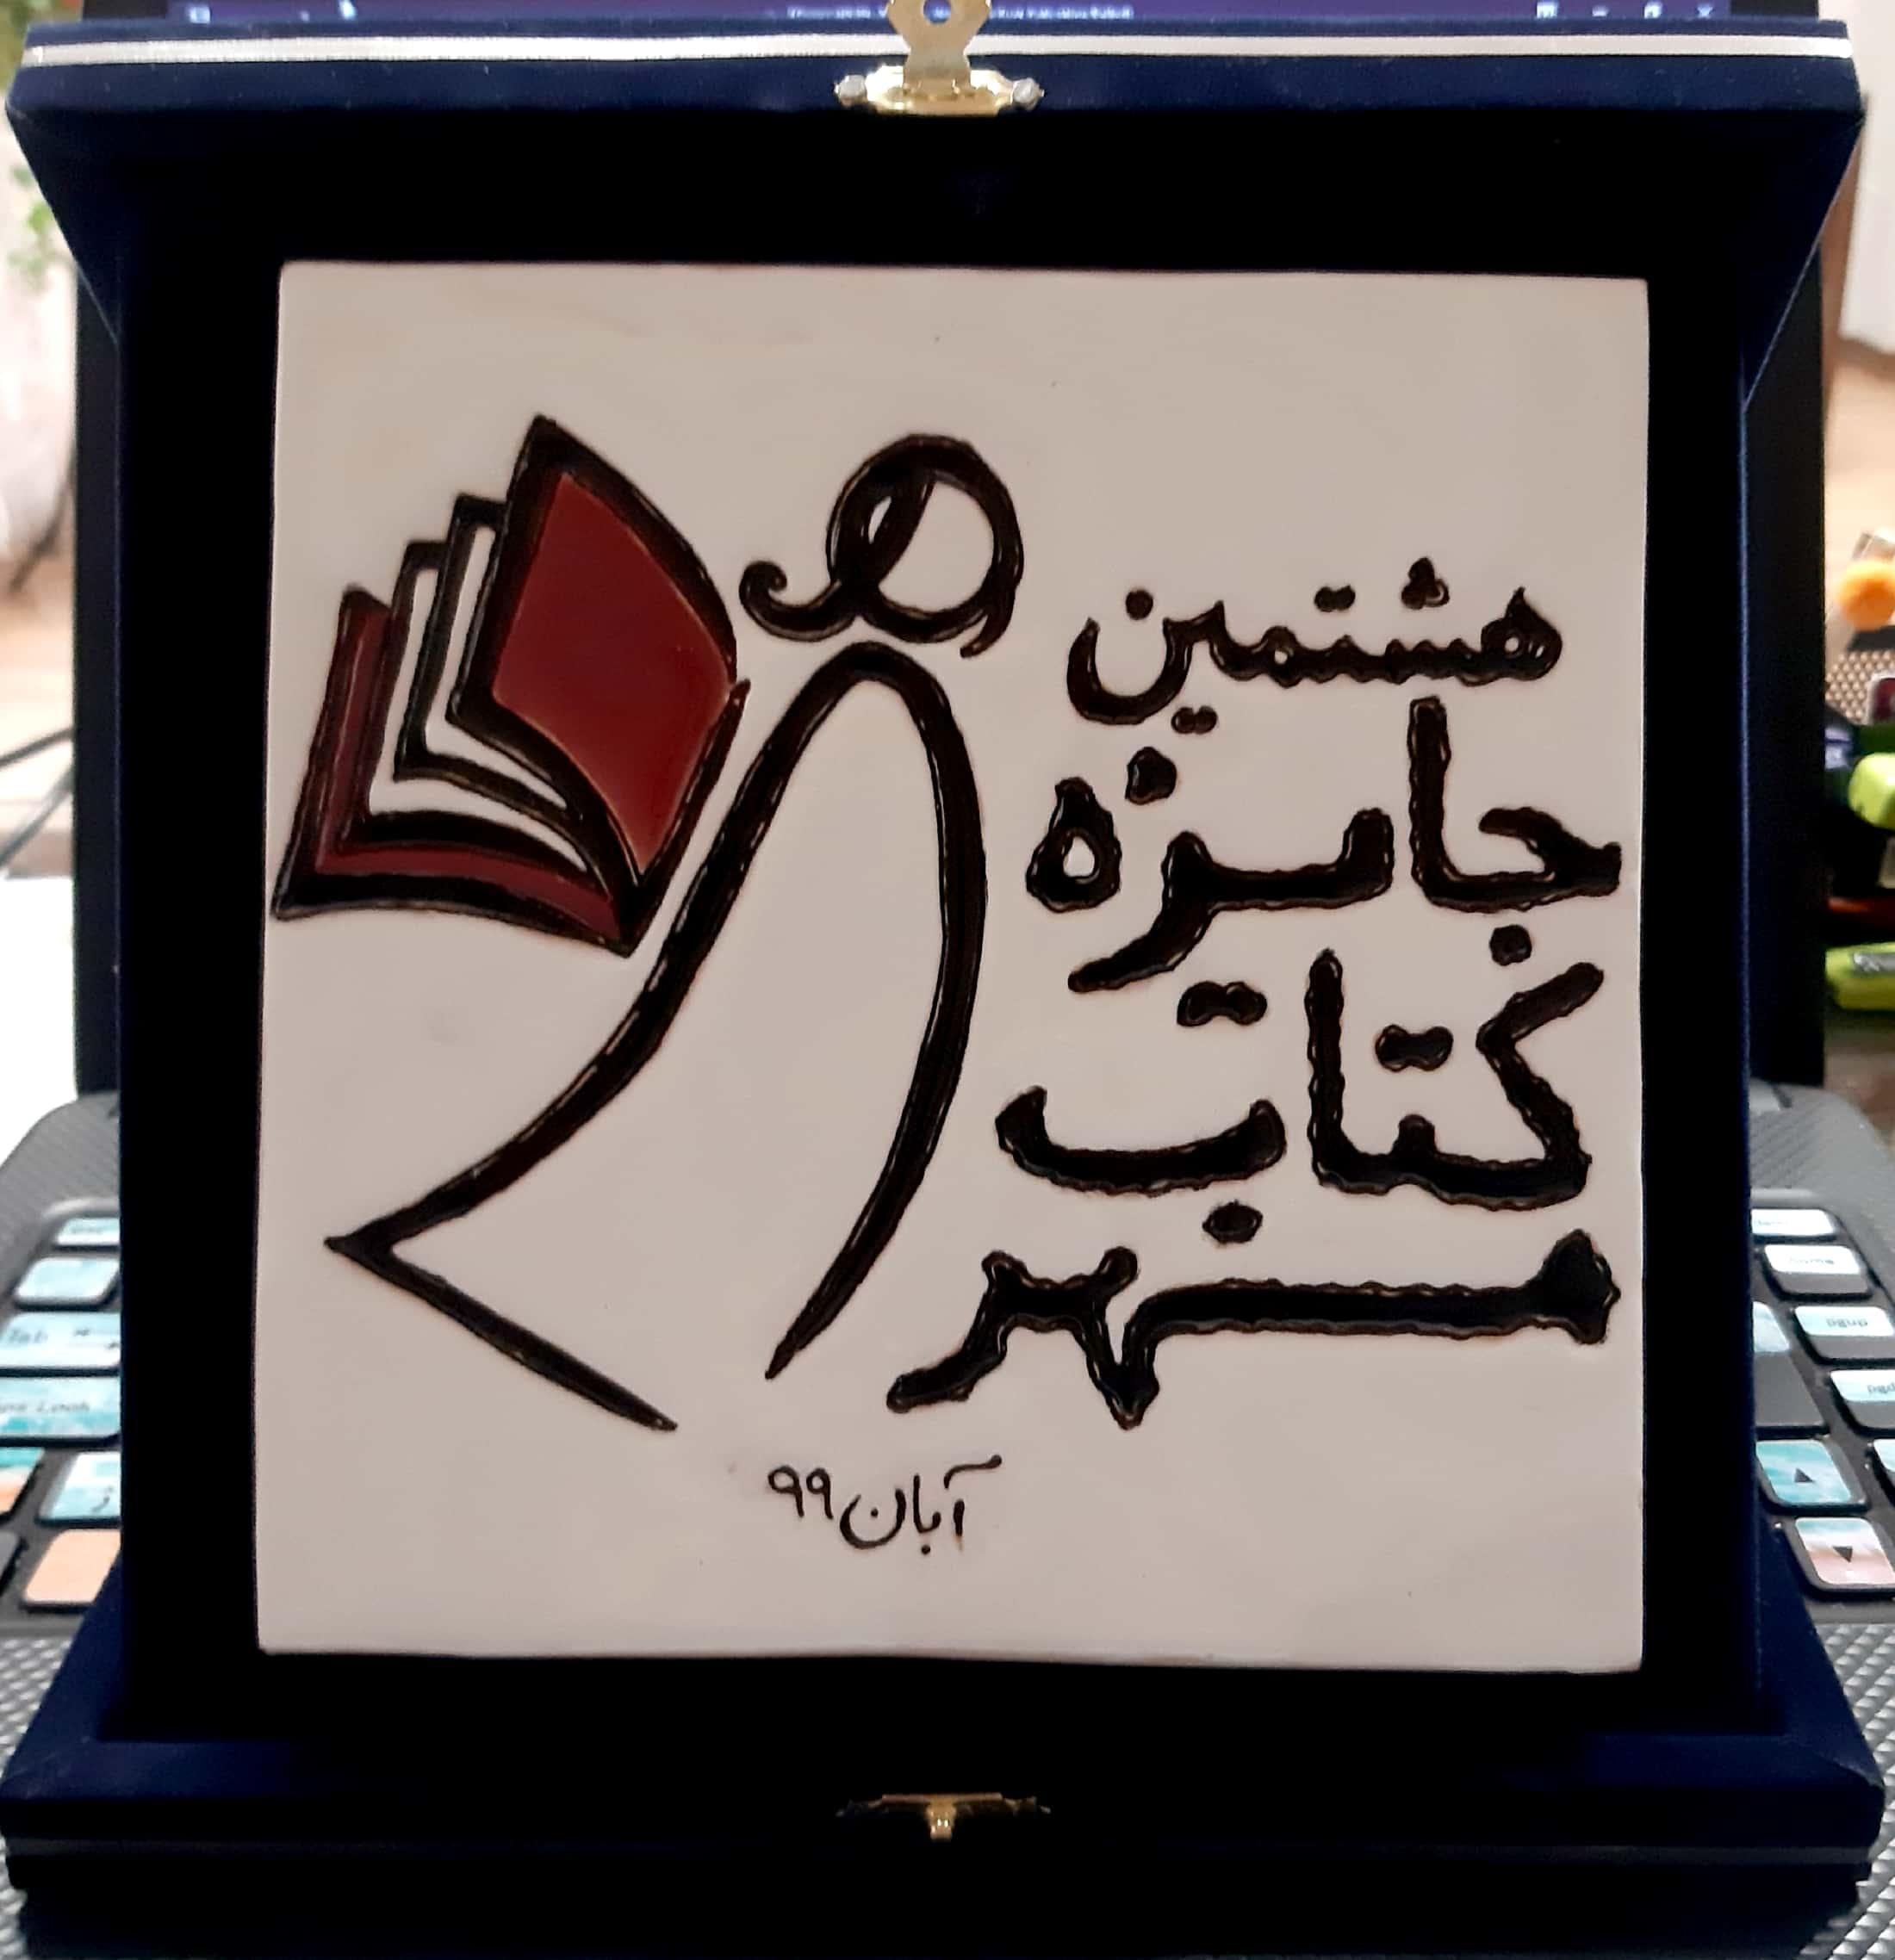 هشتمین دوره جایزه کتاب مهر